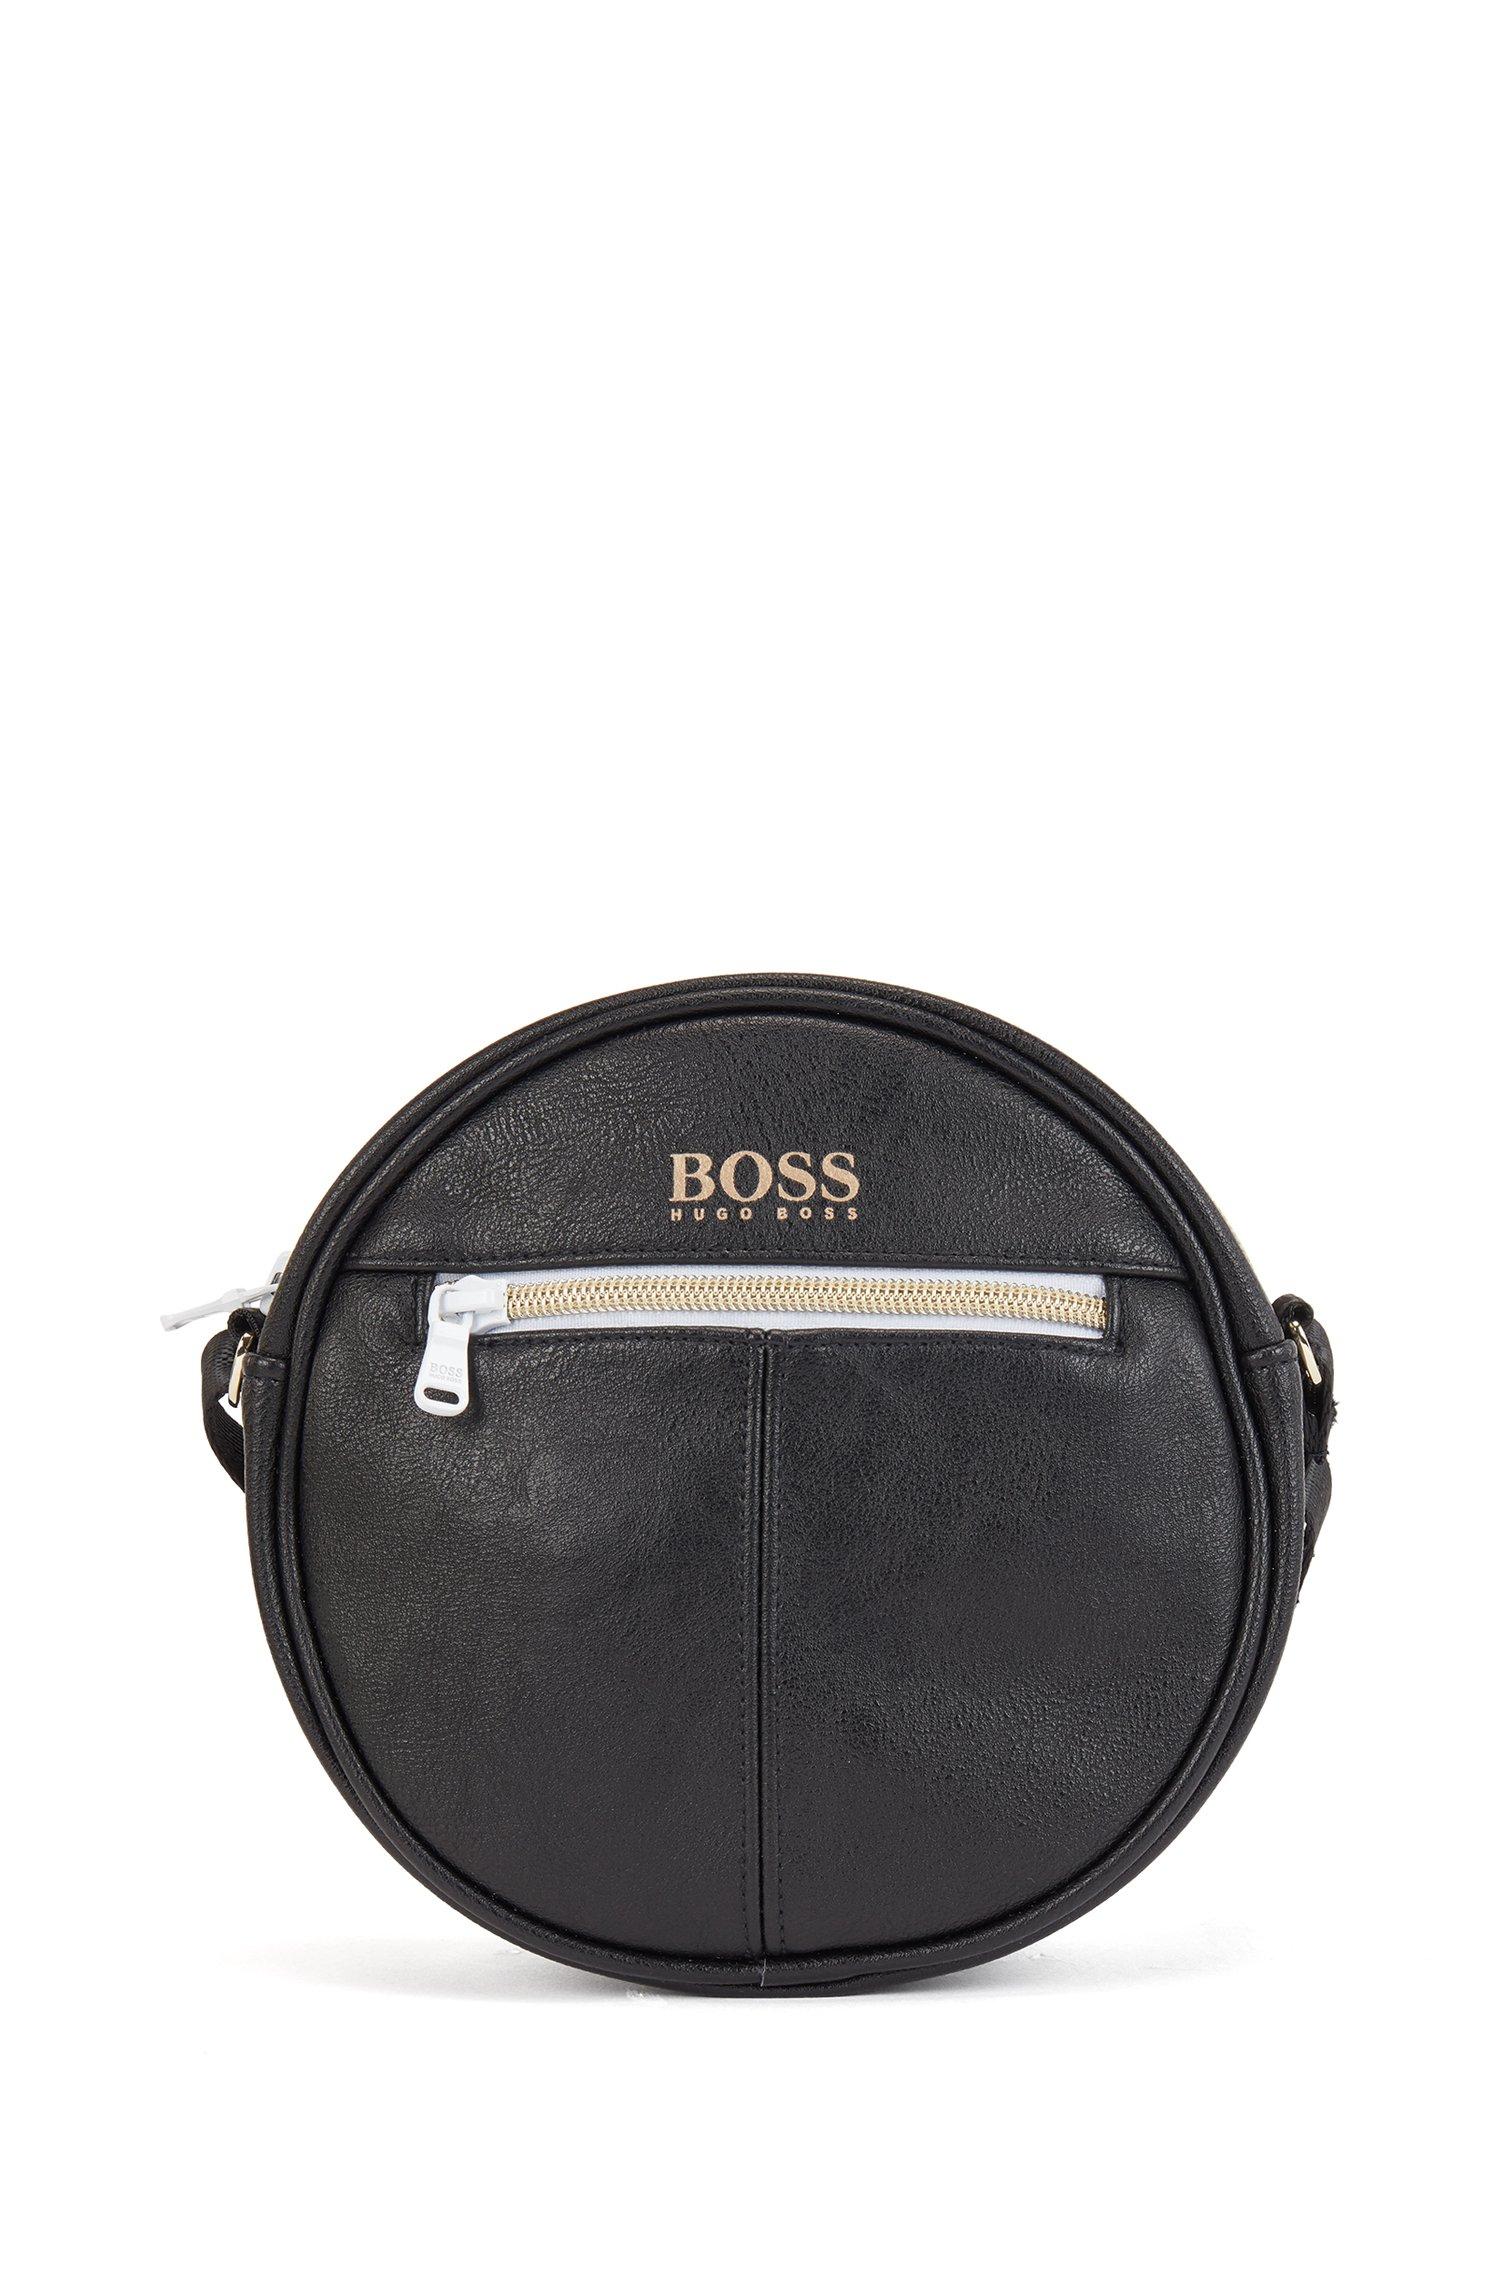 Kids' handbag in faux leather with foil-print logo, Black